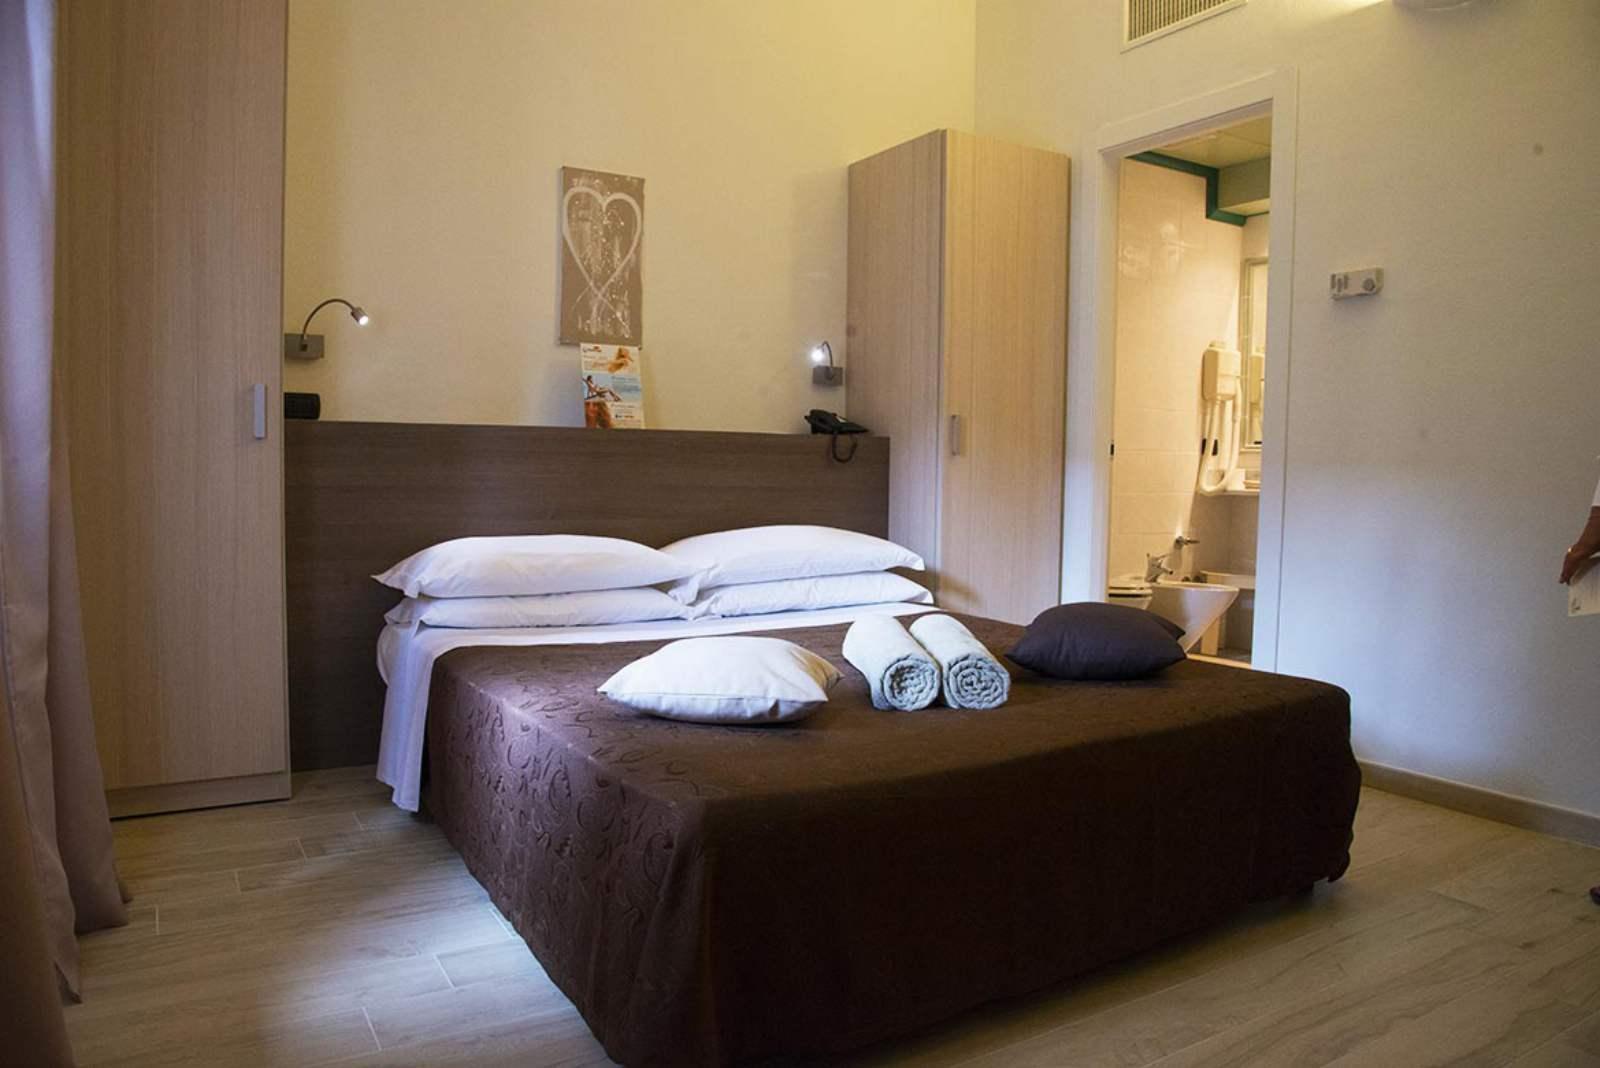 Santo Stefano Resort: room / property / locale photo. Image 5